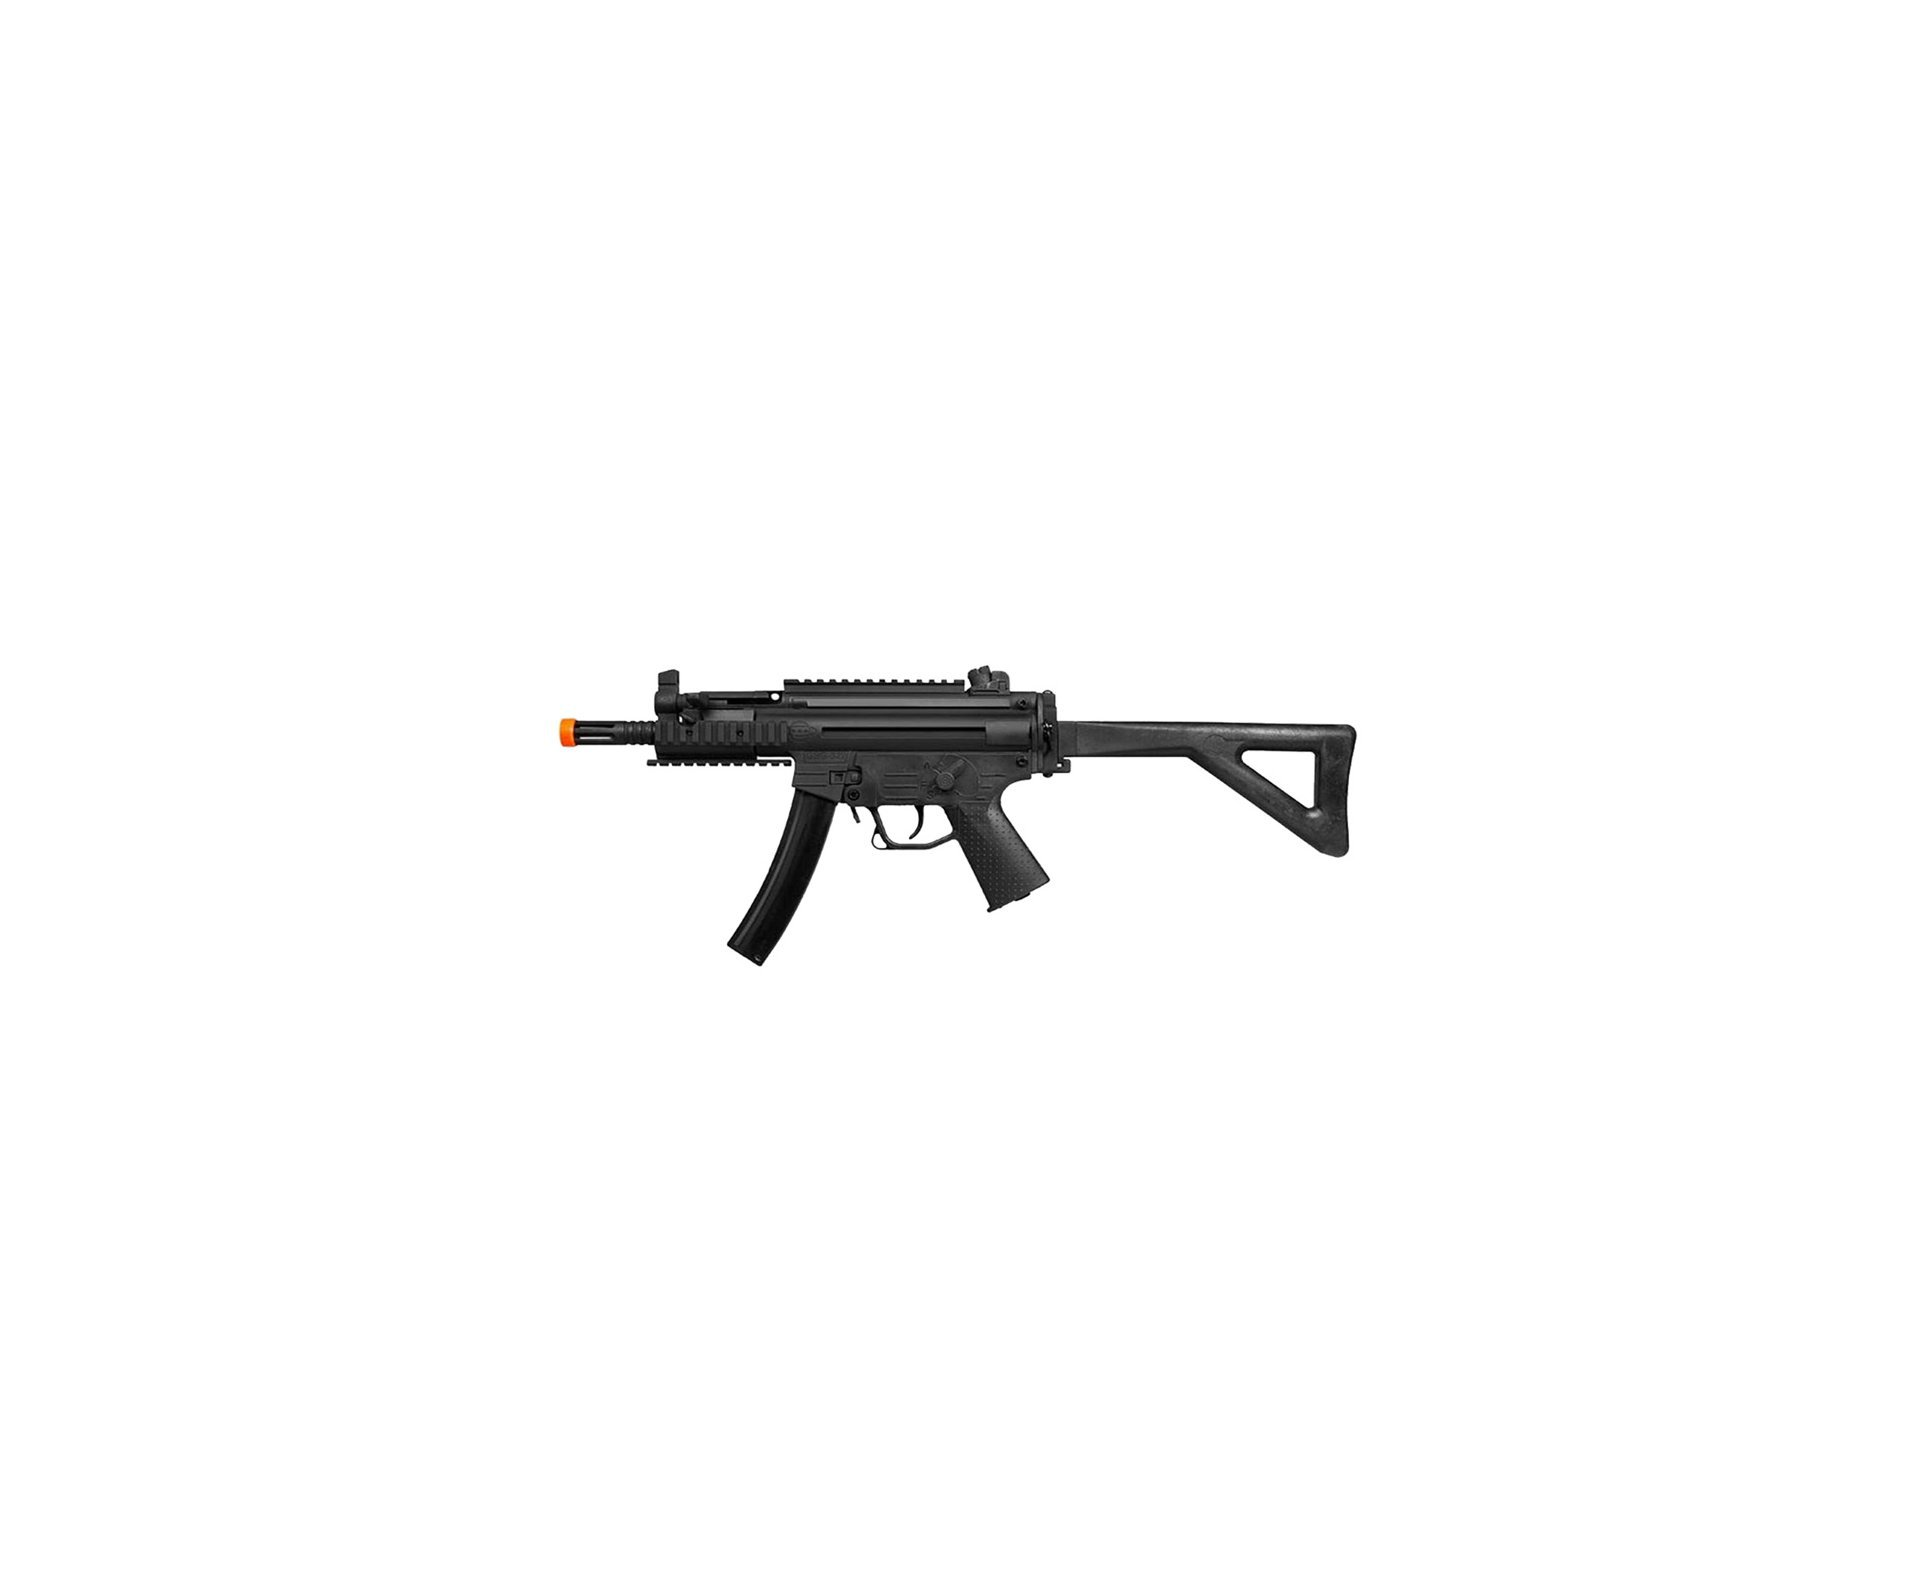 Rifle De Airsoft Gsg-522 Pk Folding Stock - Full Metal - Cal 6,0 Mm - 220 V